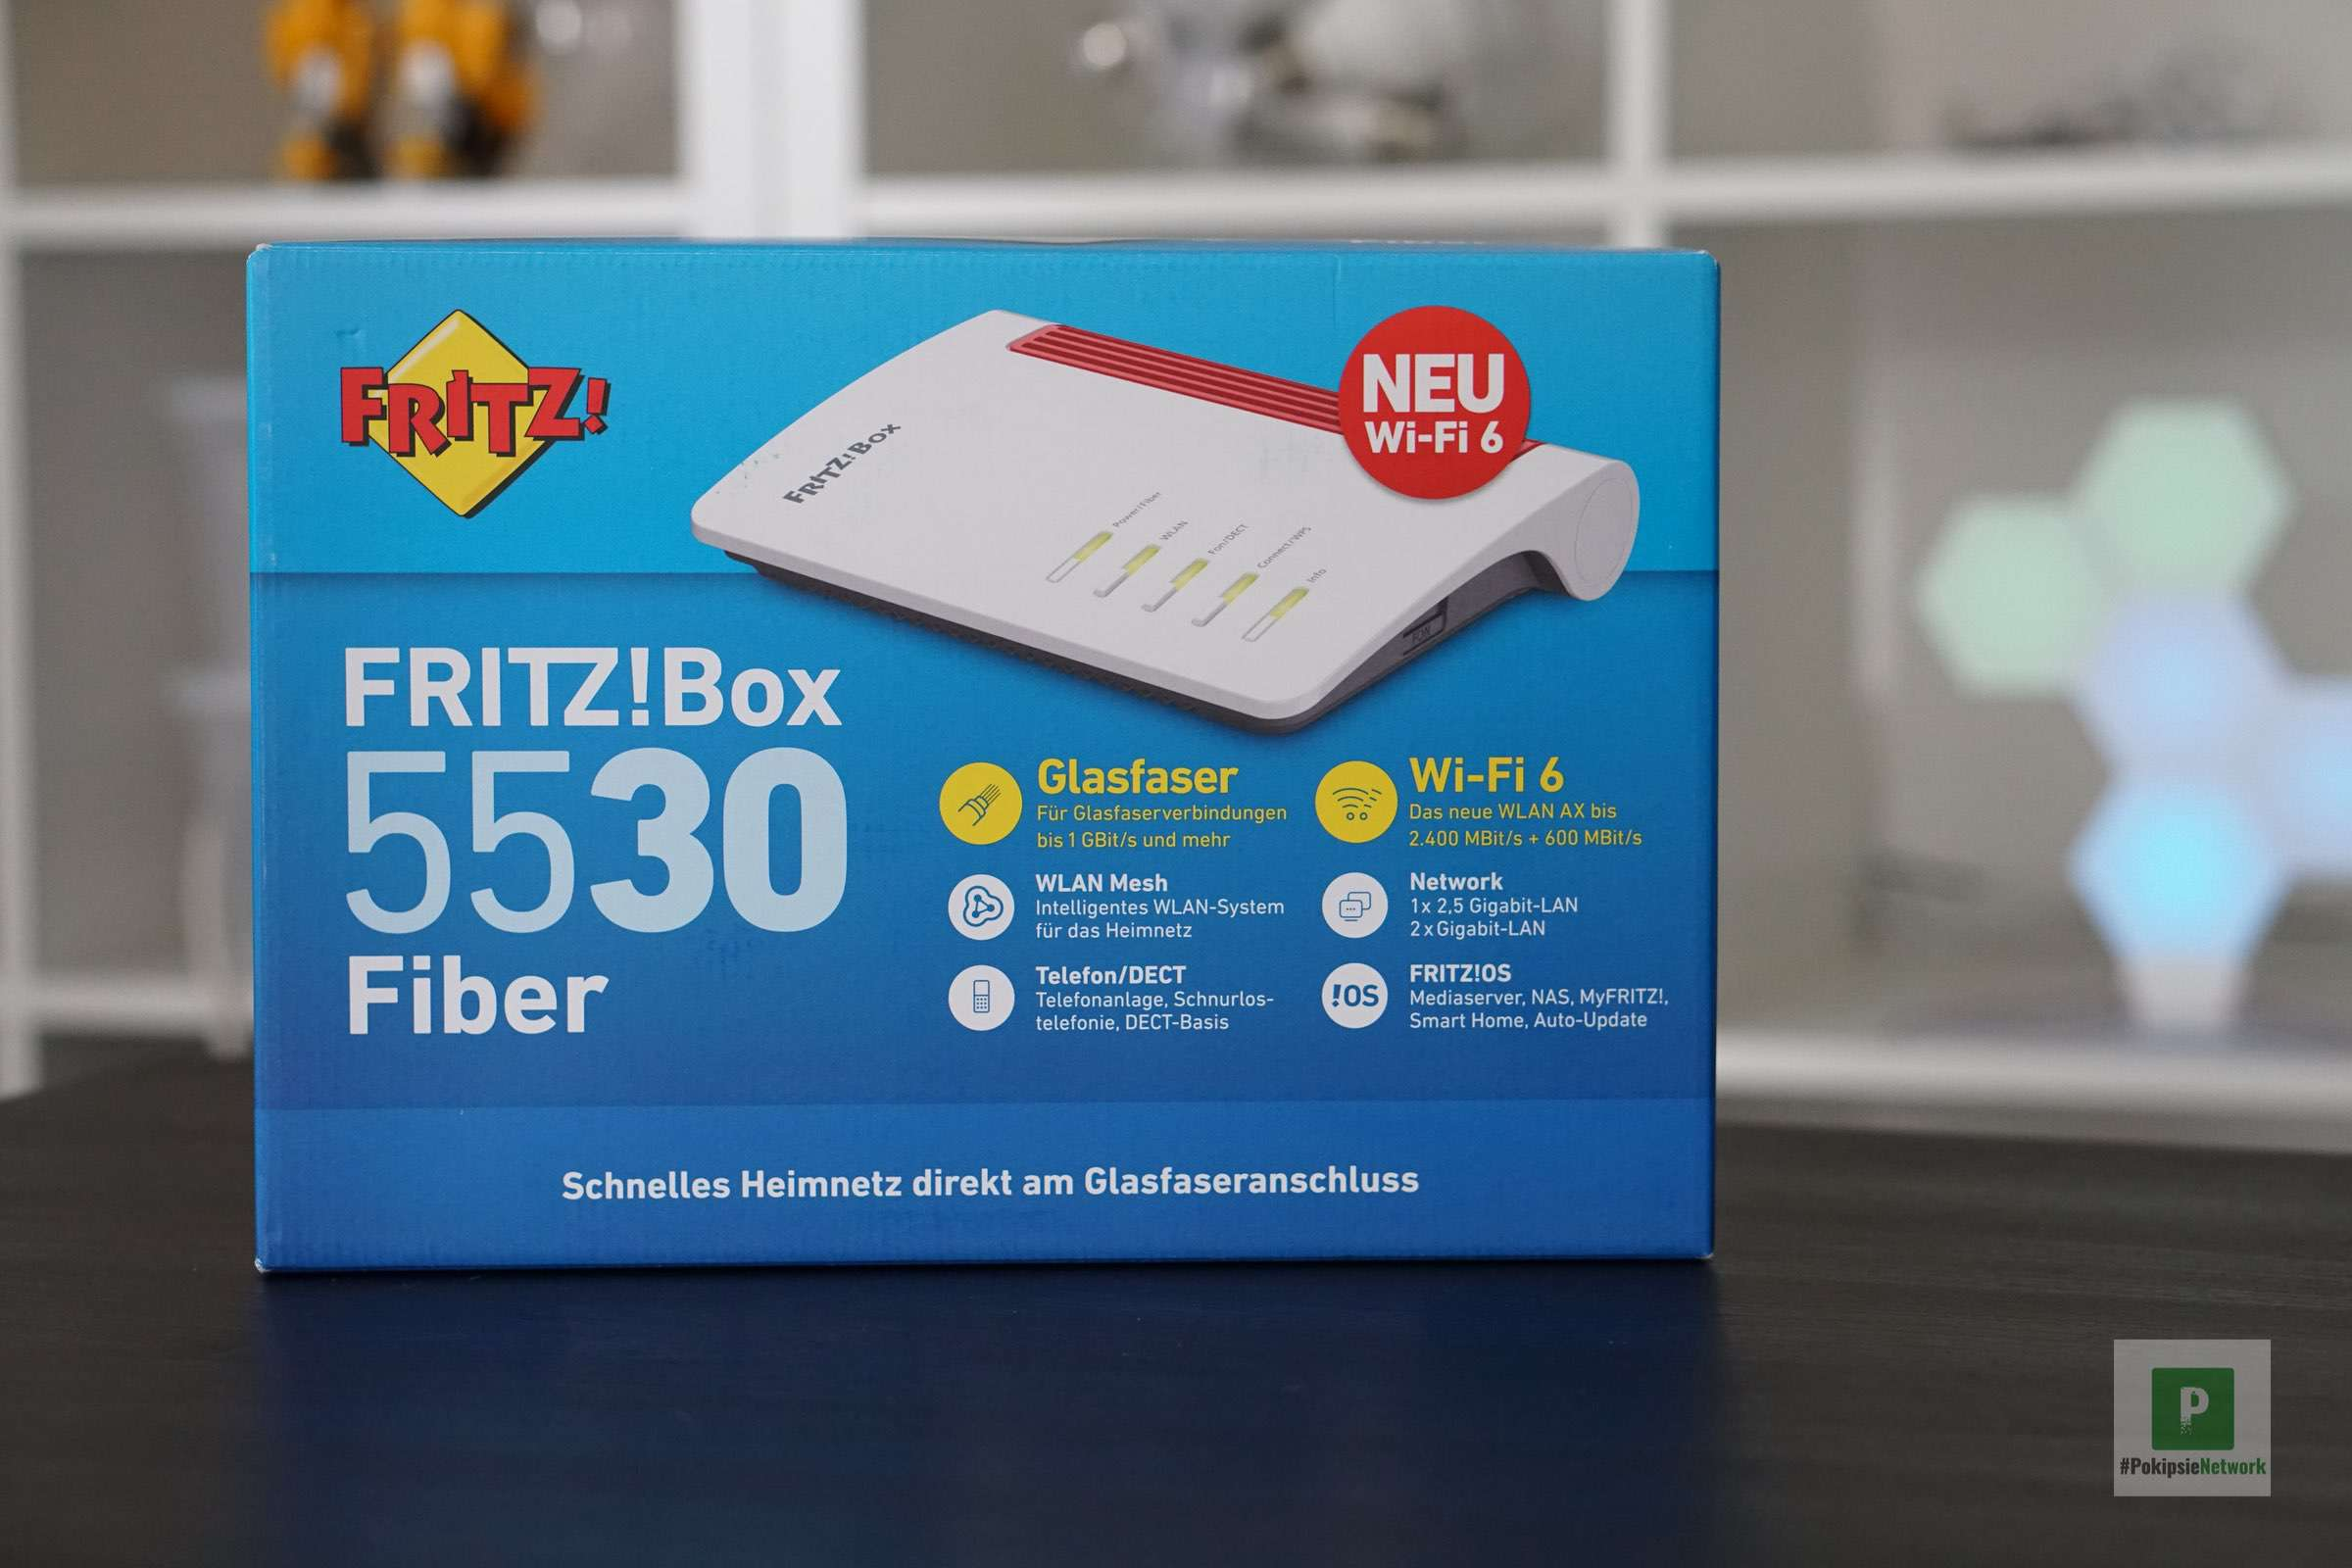 AVM FRITZ!Box 5530 Fiber AON in der Schweiz